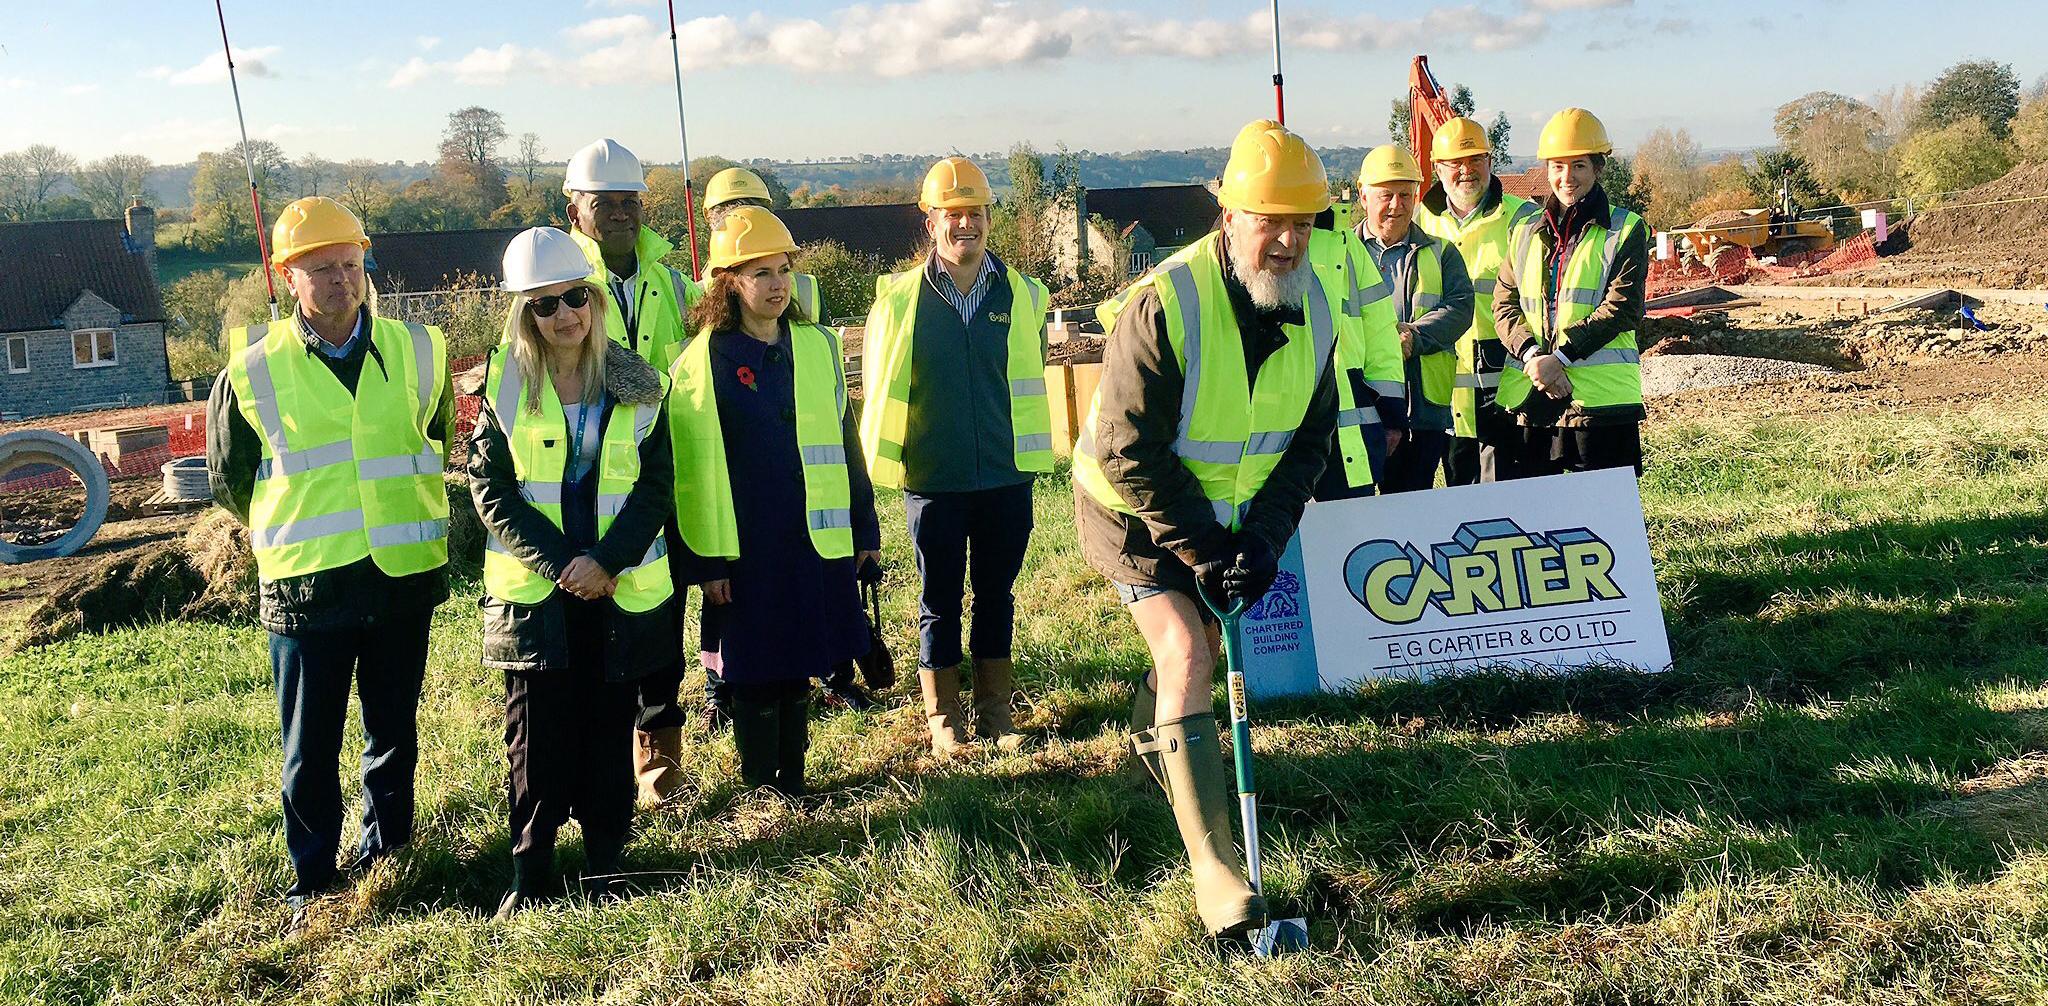 Michael Eavis, Glastonbury Festival's founder, digging at new building site.